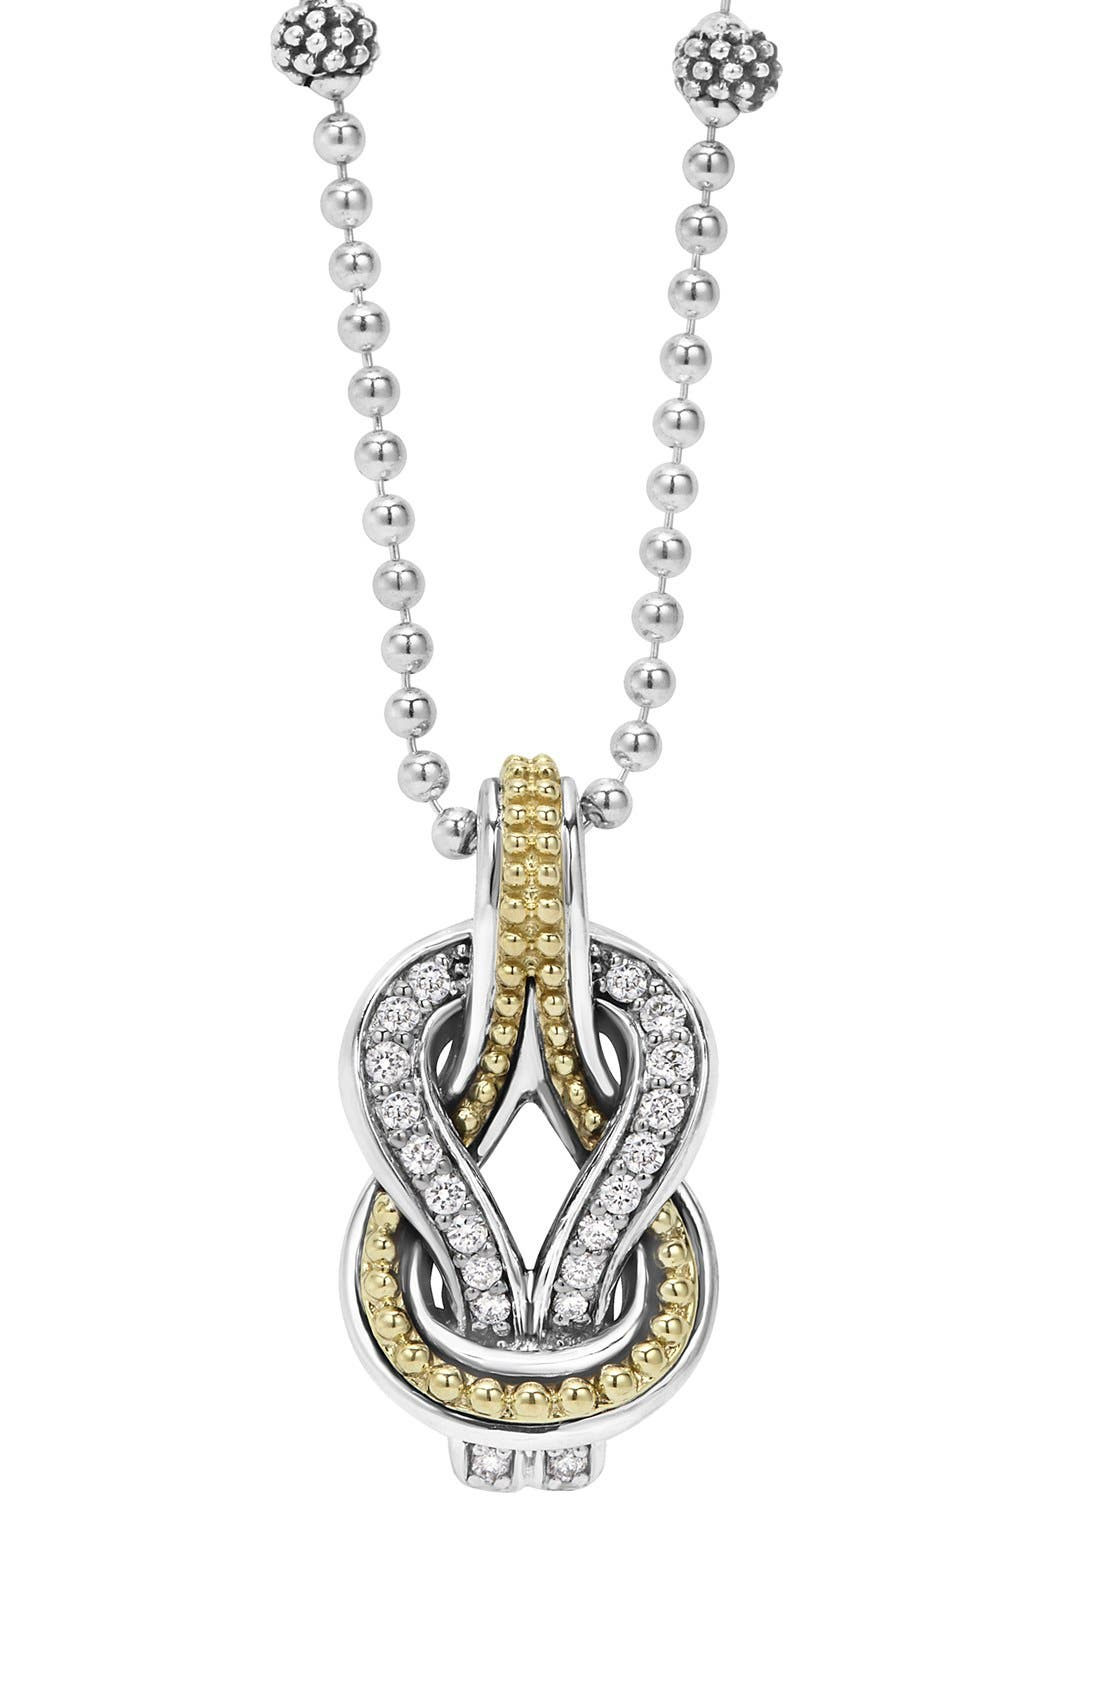 LAGOS Newport Diamond Knot Pendant Necklace